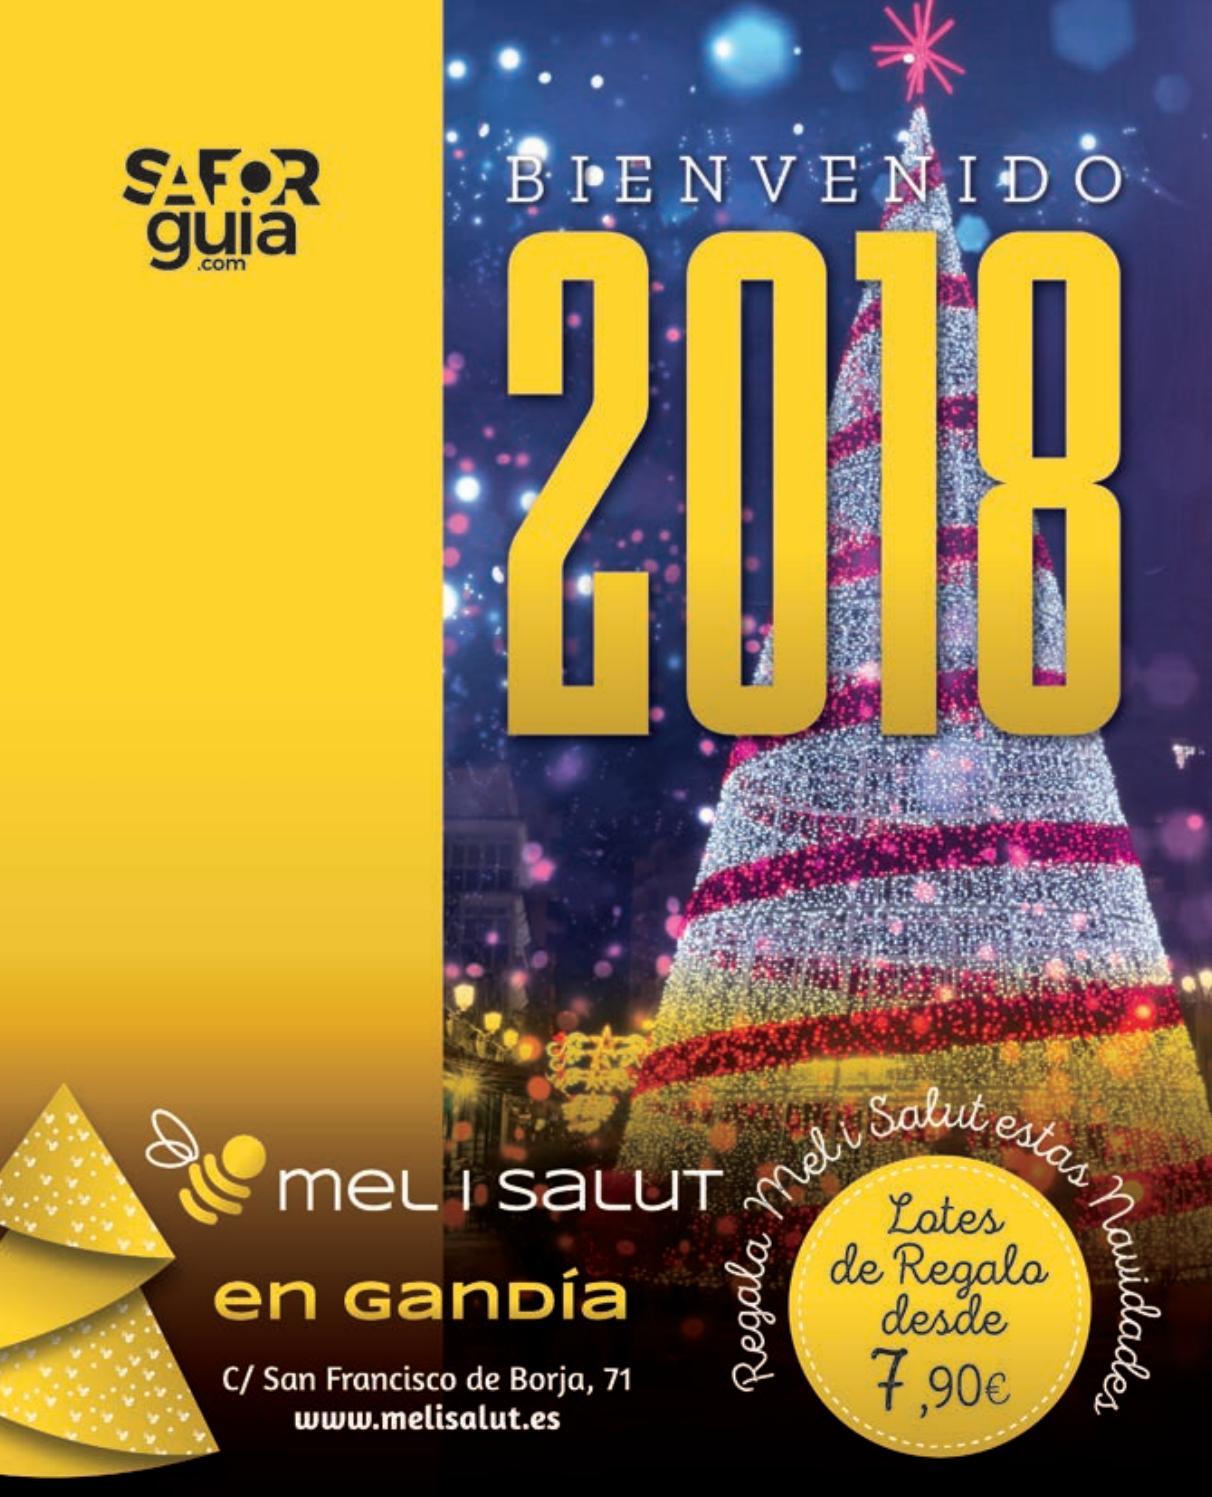 Mut Extra Issuu Ramon 2017 By Portoles Guia Nadal Safor fvY7yb6g